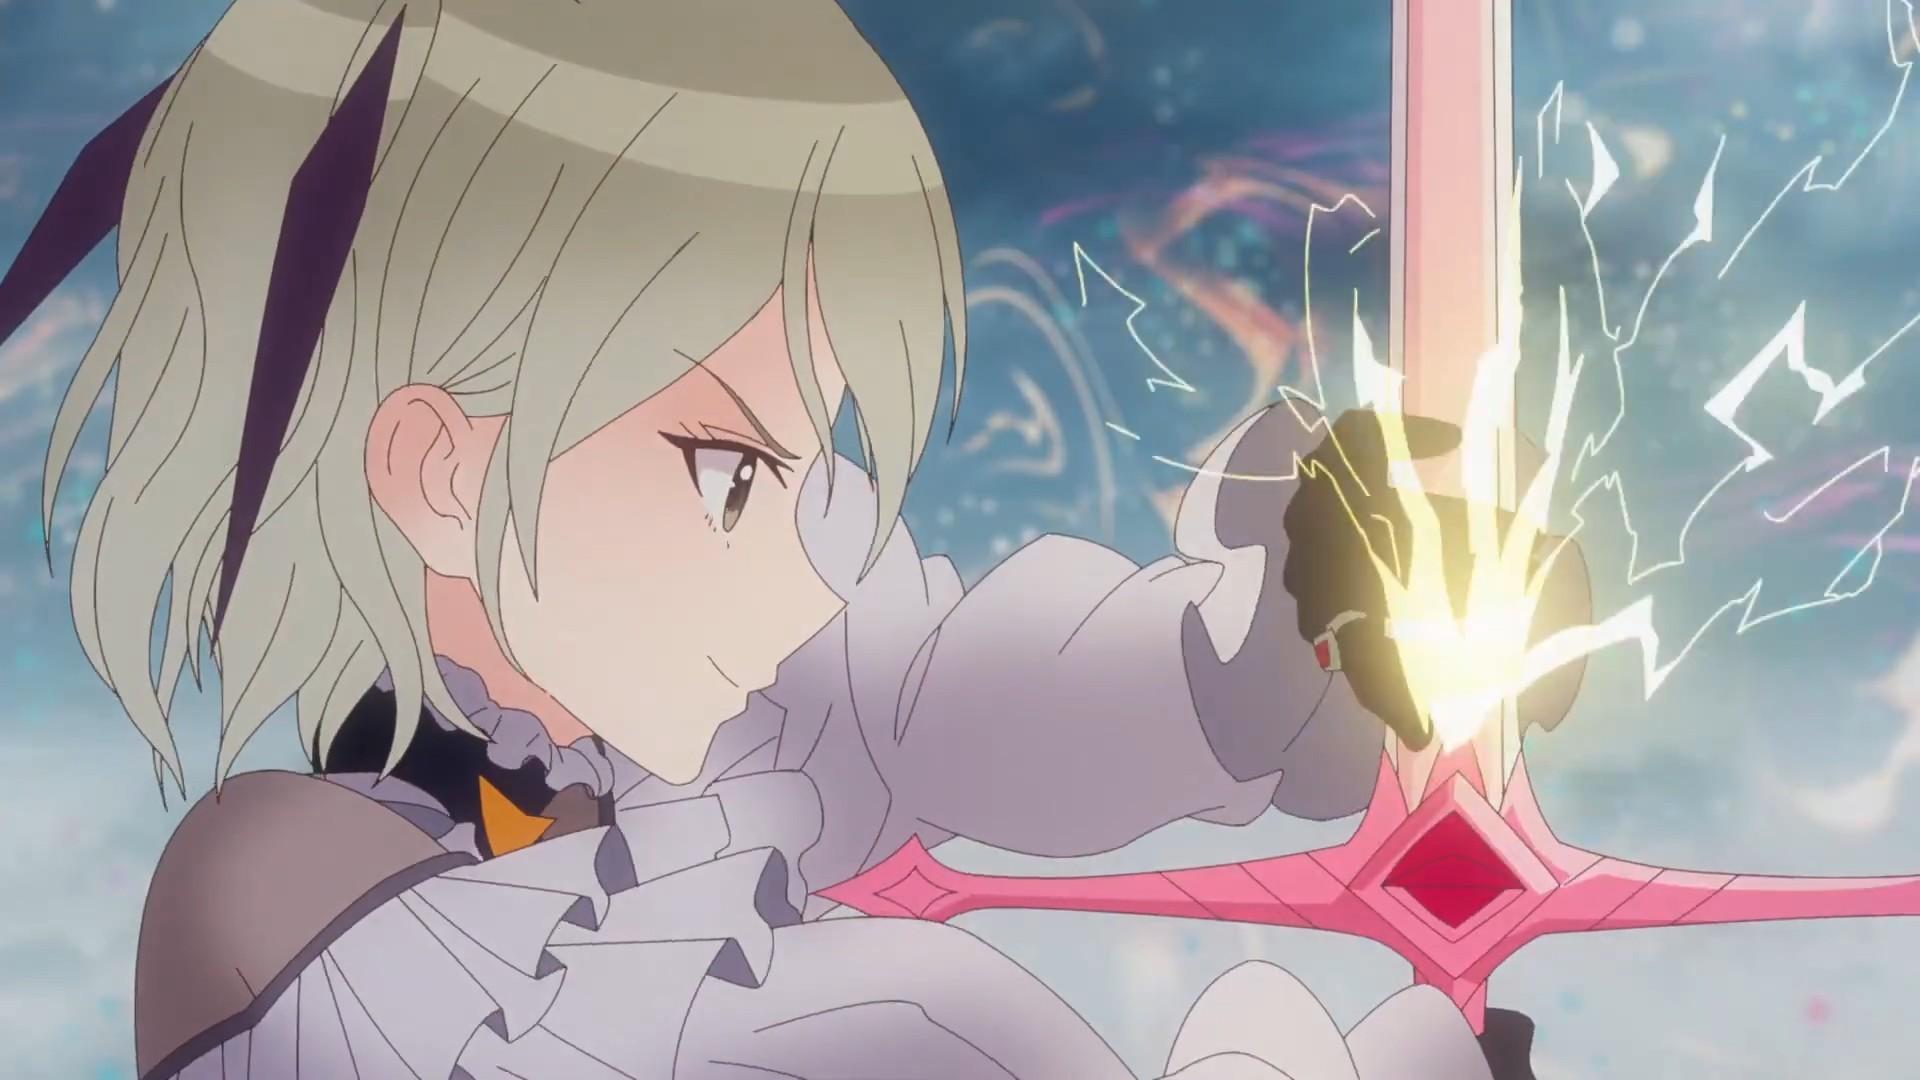 【动漫情报】TV动画《BLUE REFLECTION RAY/澪》正式PV公开,4月9日正式开播。